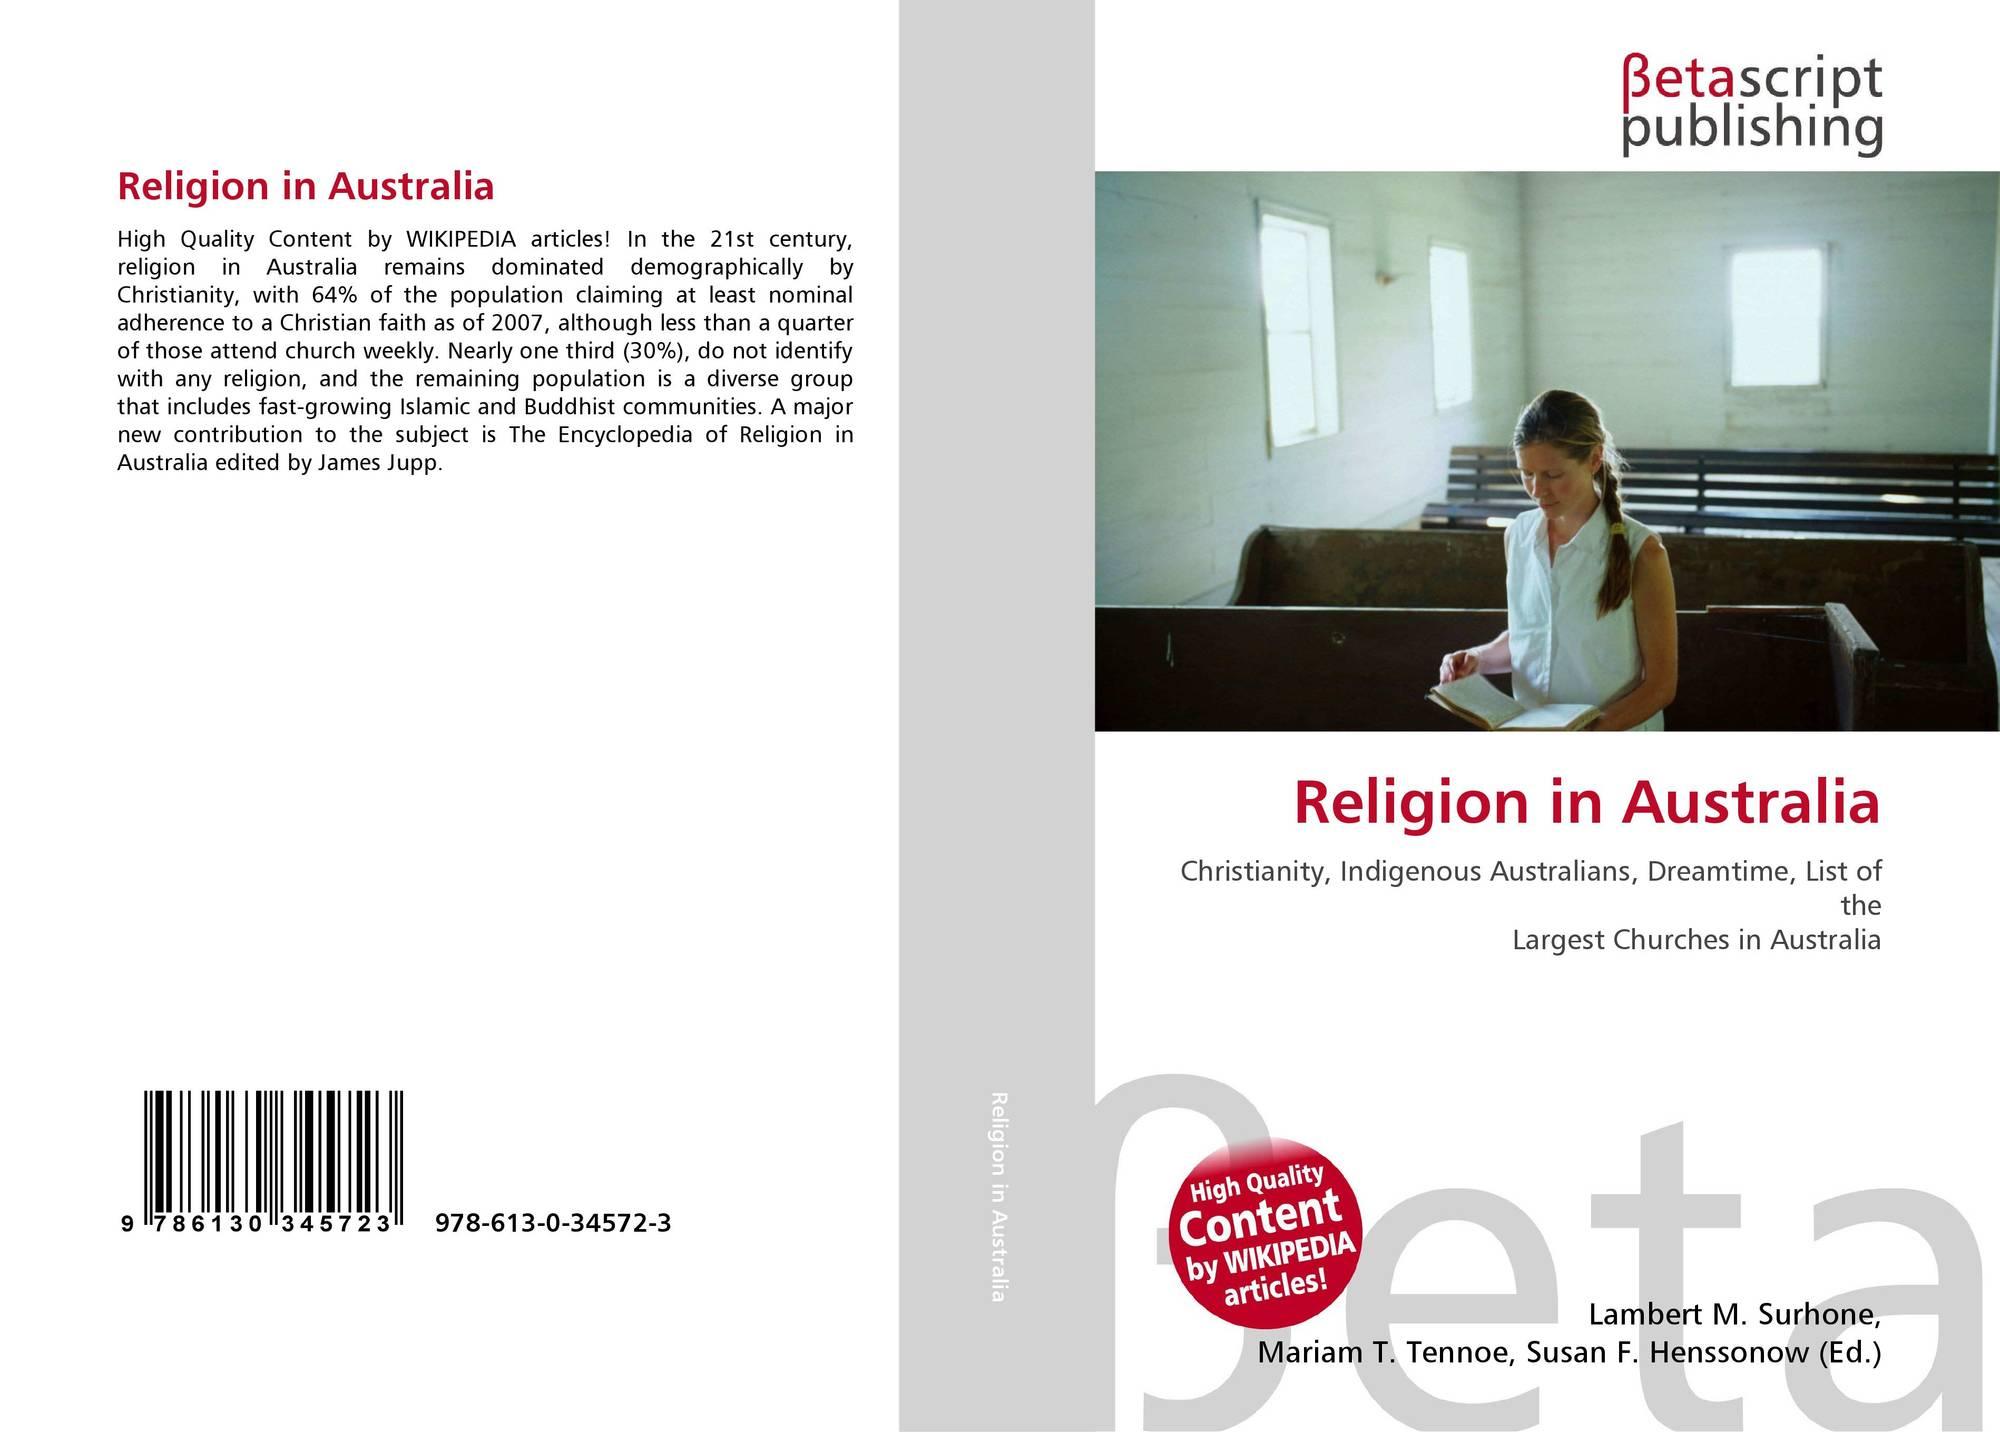 Religion in Australia, 978-613-0-34572-3, 6130345720